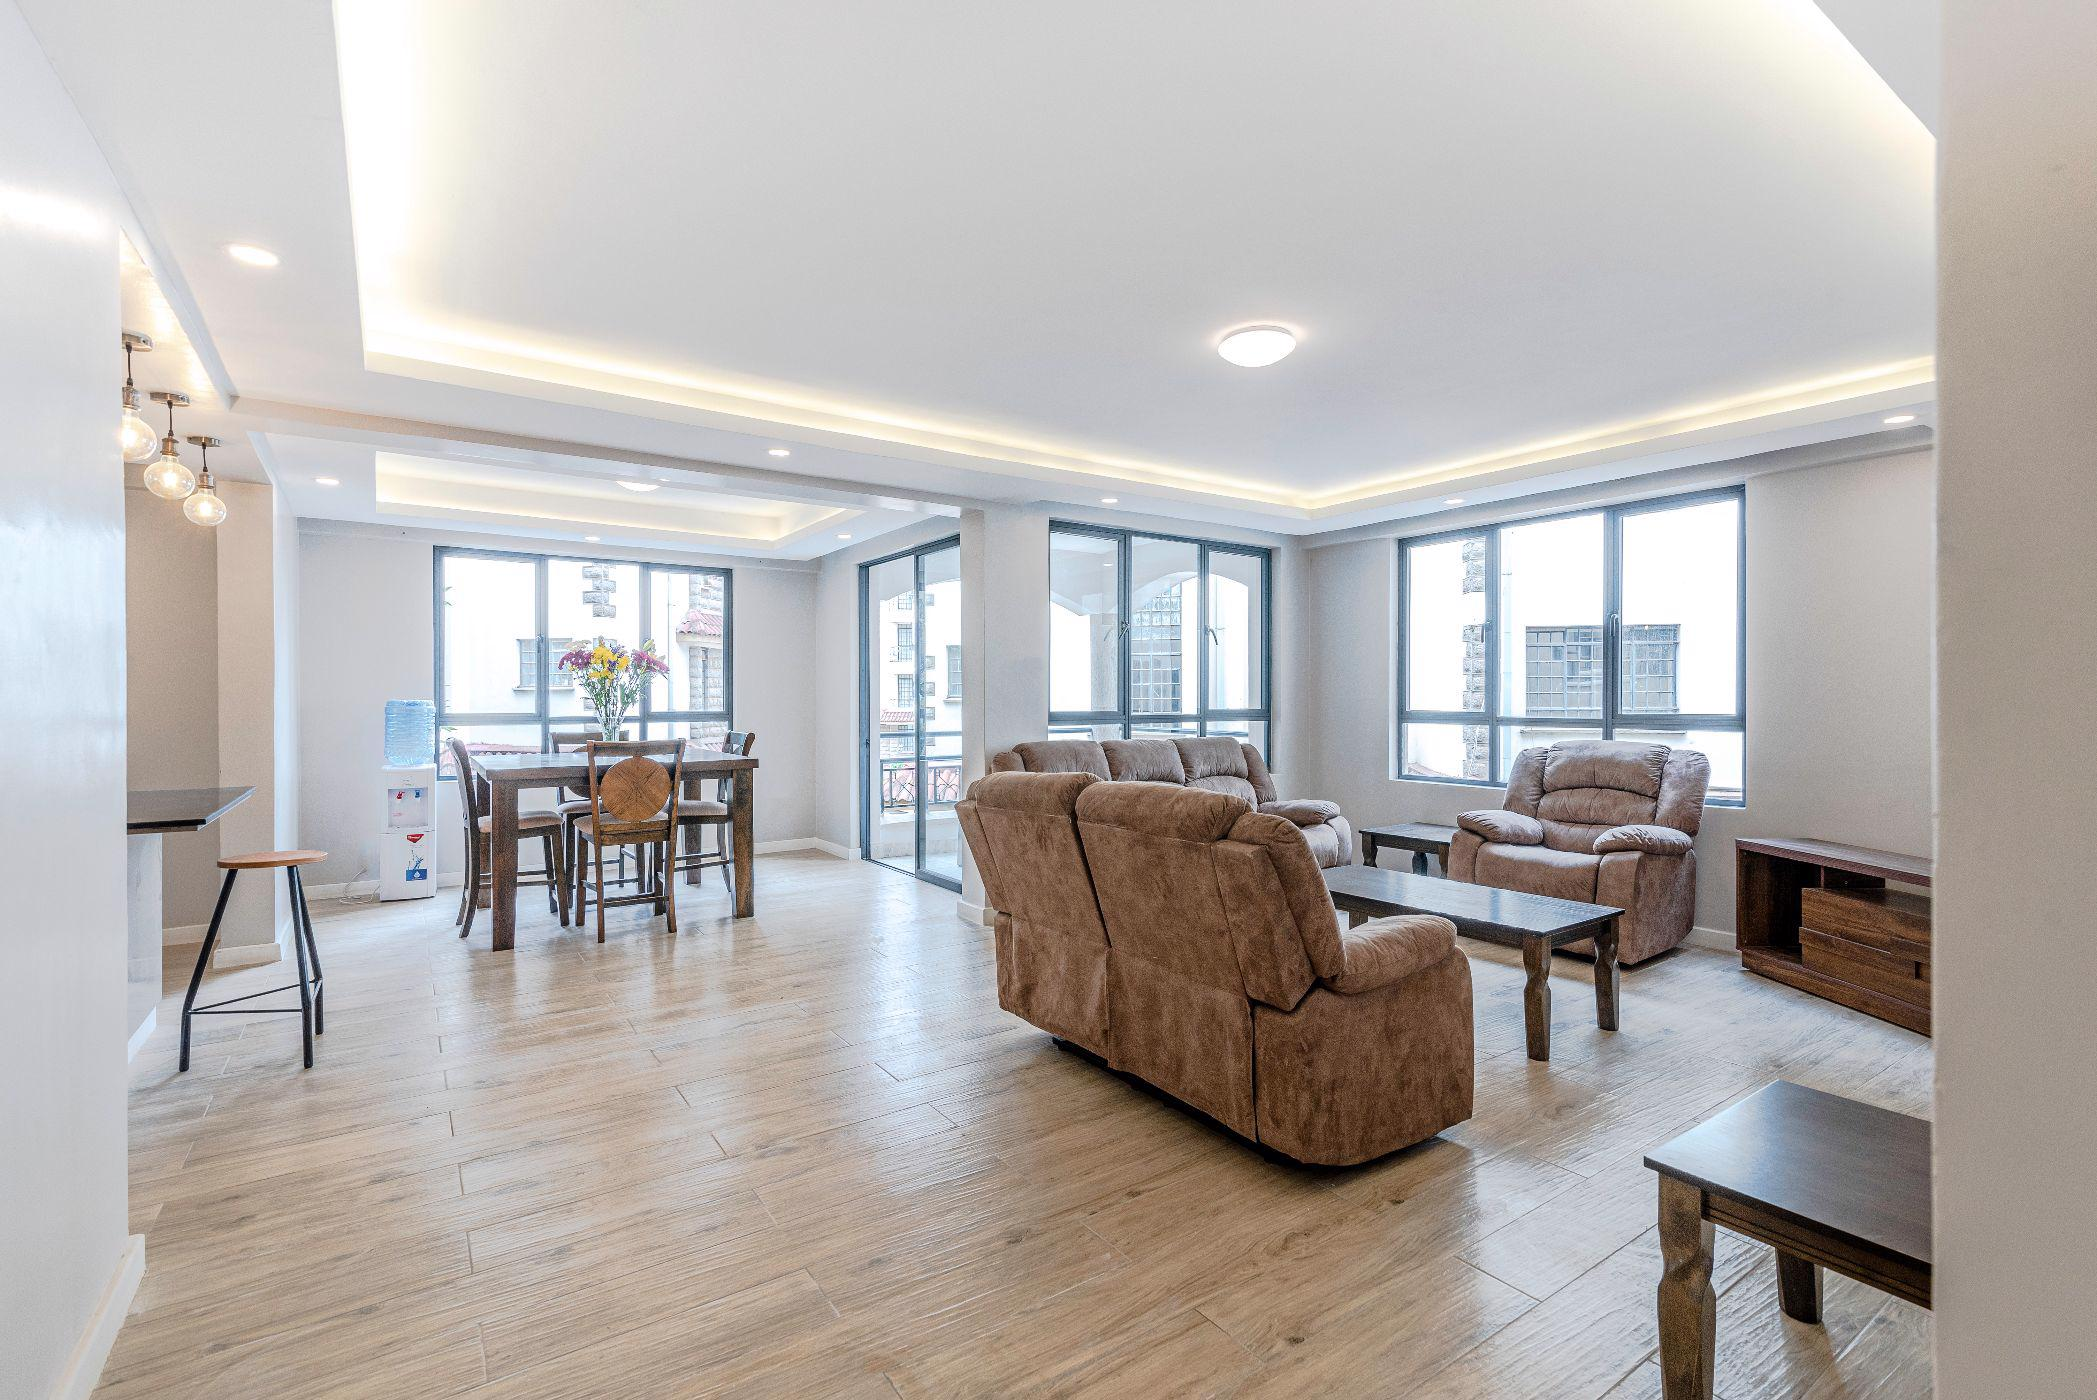 4 bedroom penthouse apartment to rent in Lavington (Kenya)